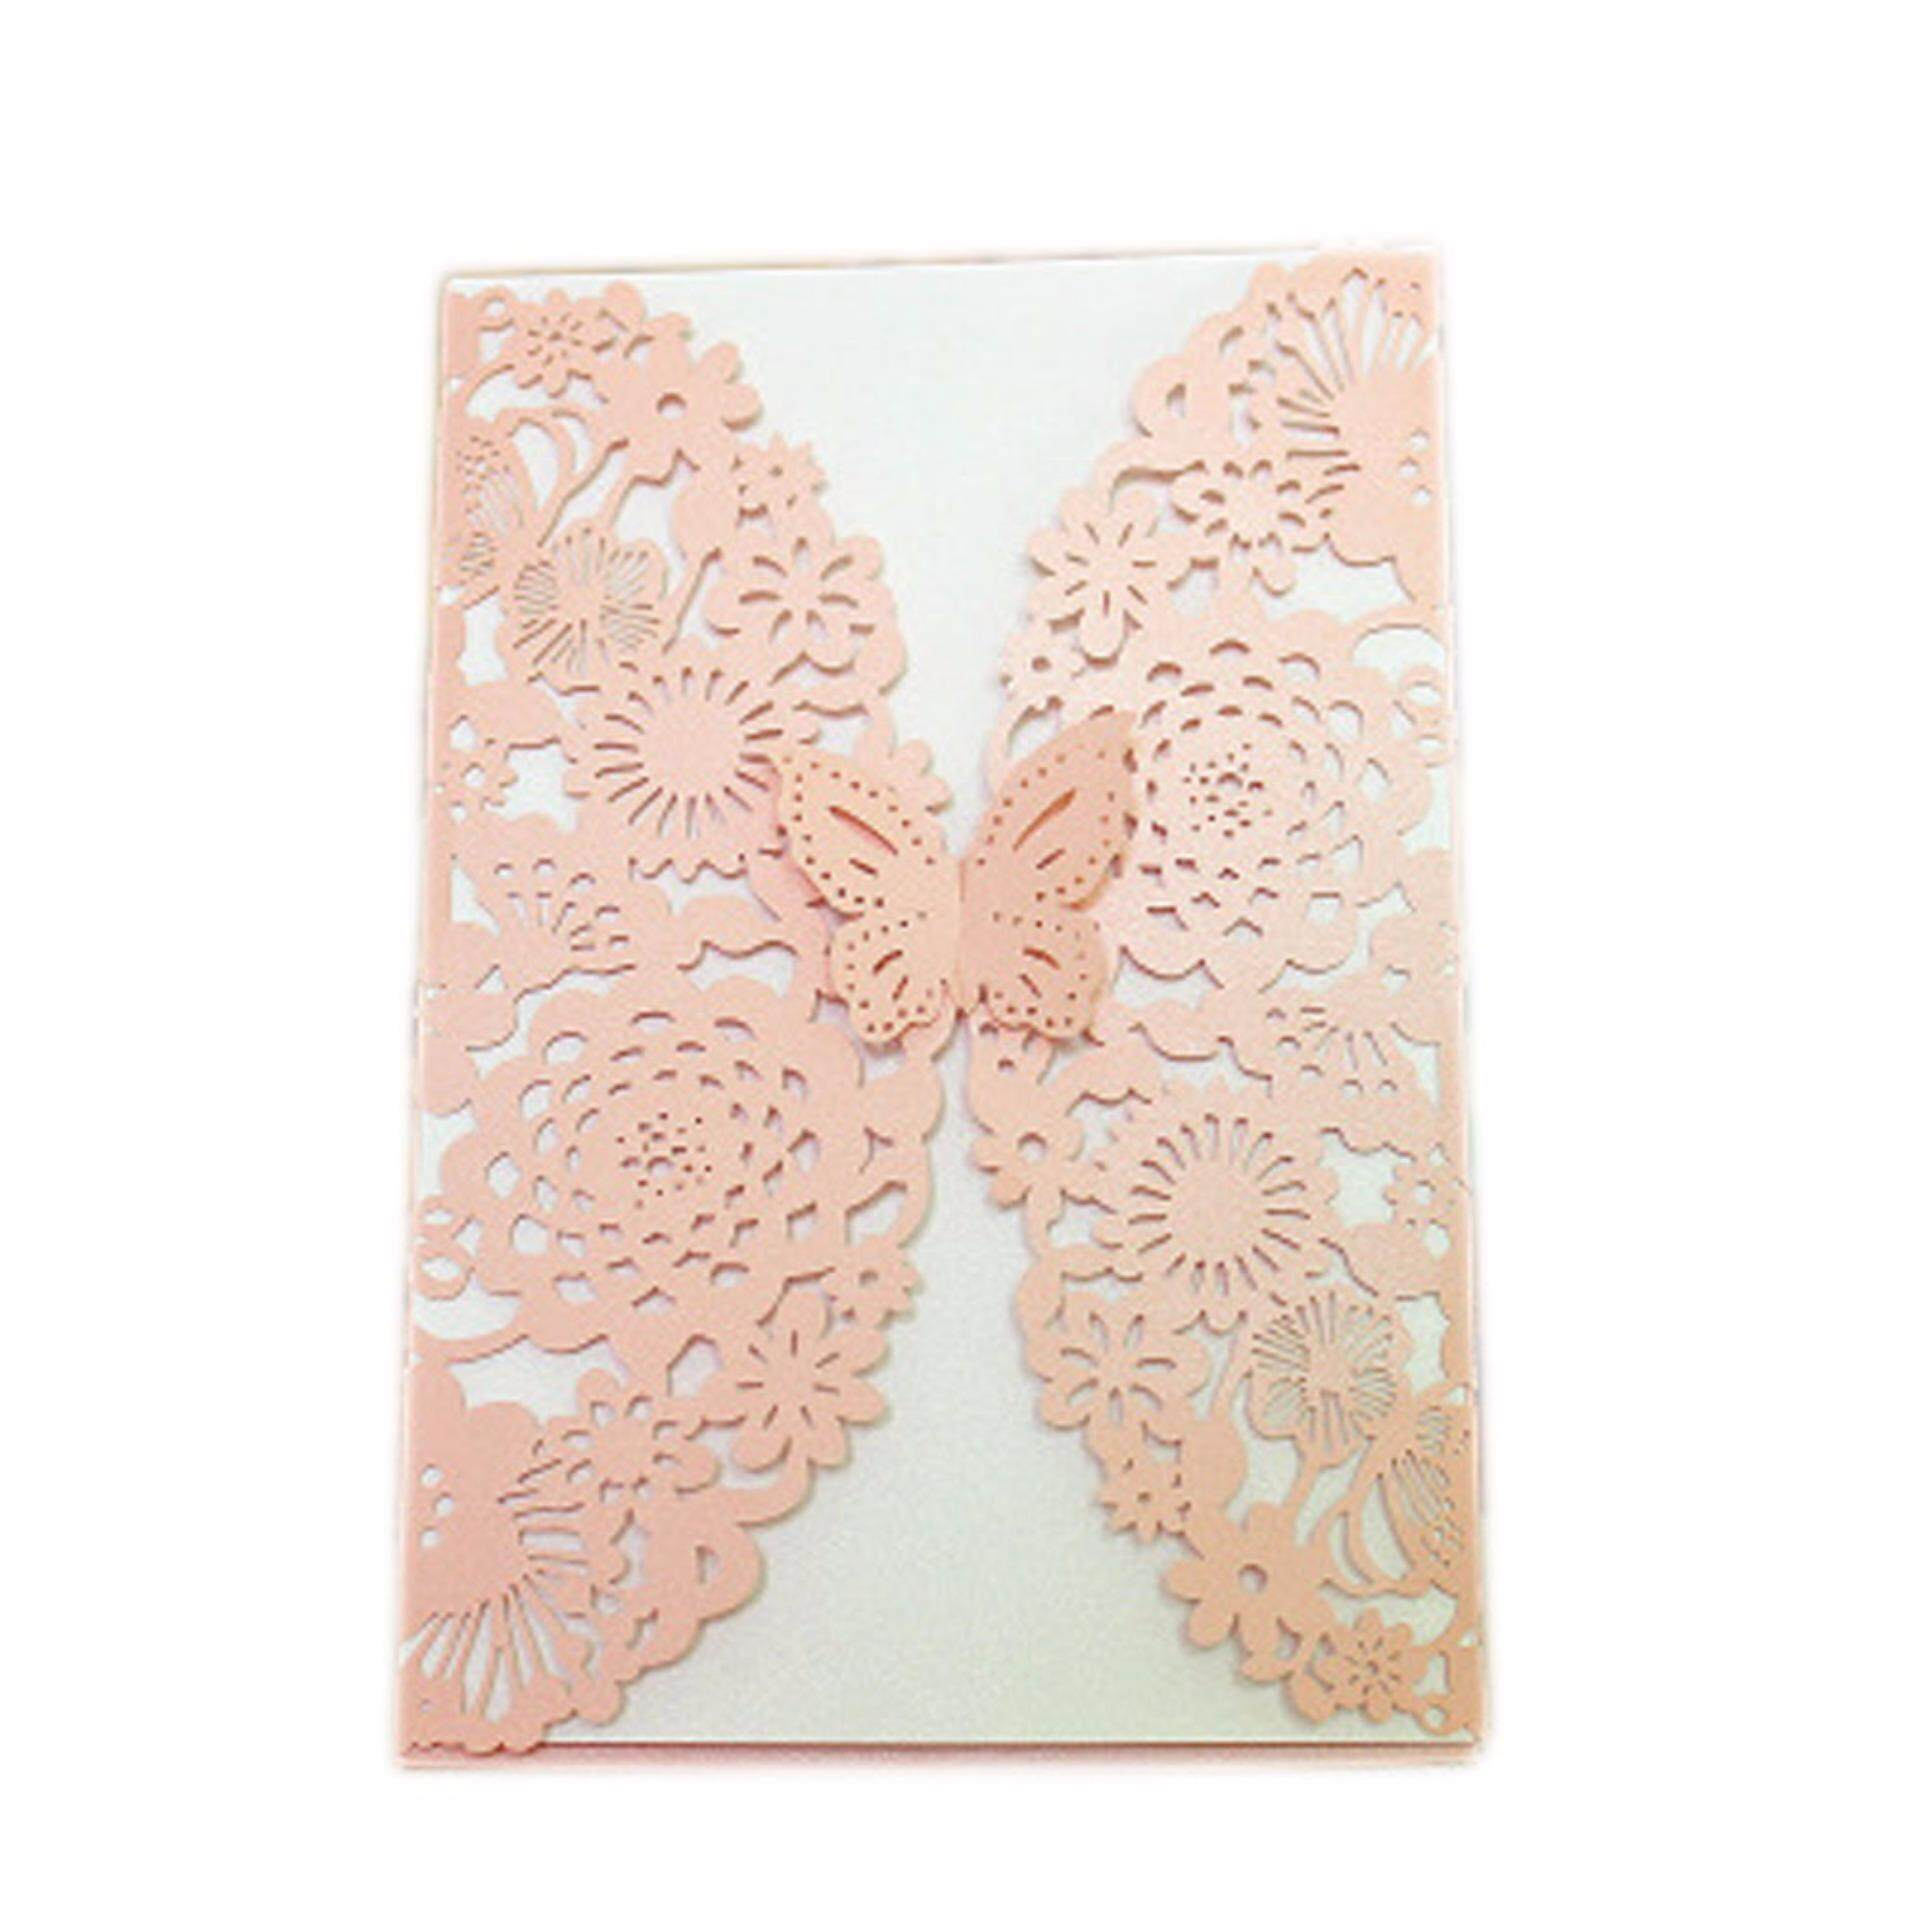 Hình ảnh Fancyqube 2Pcs Delicate Carved Butterflies Romantic Wedding Party Invitation Card H05 - intl